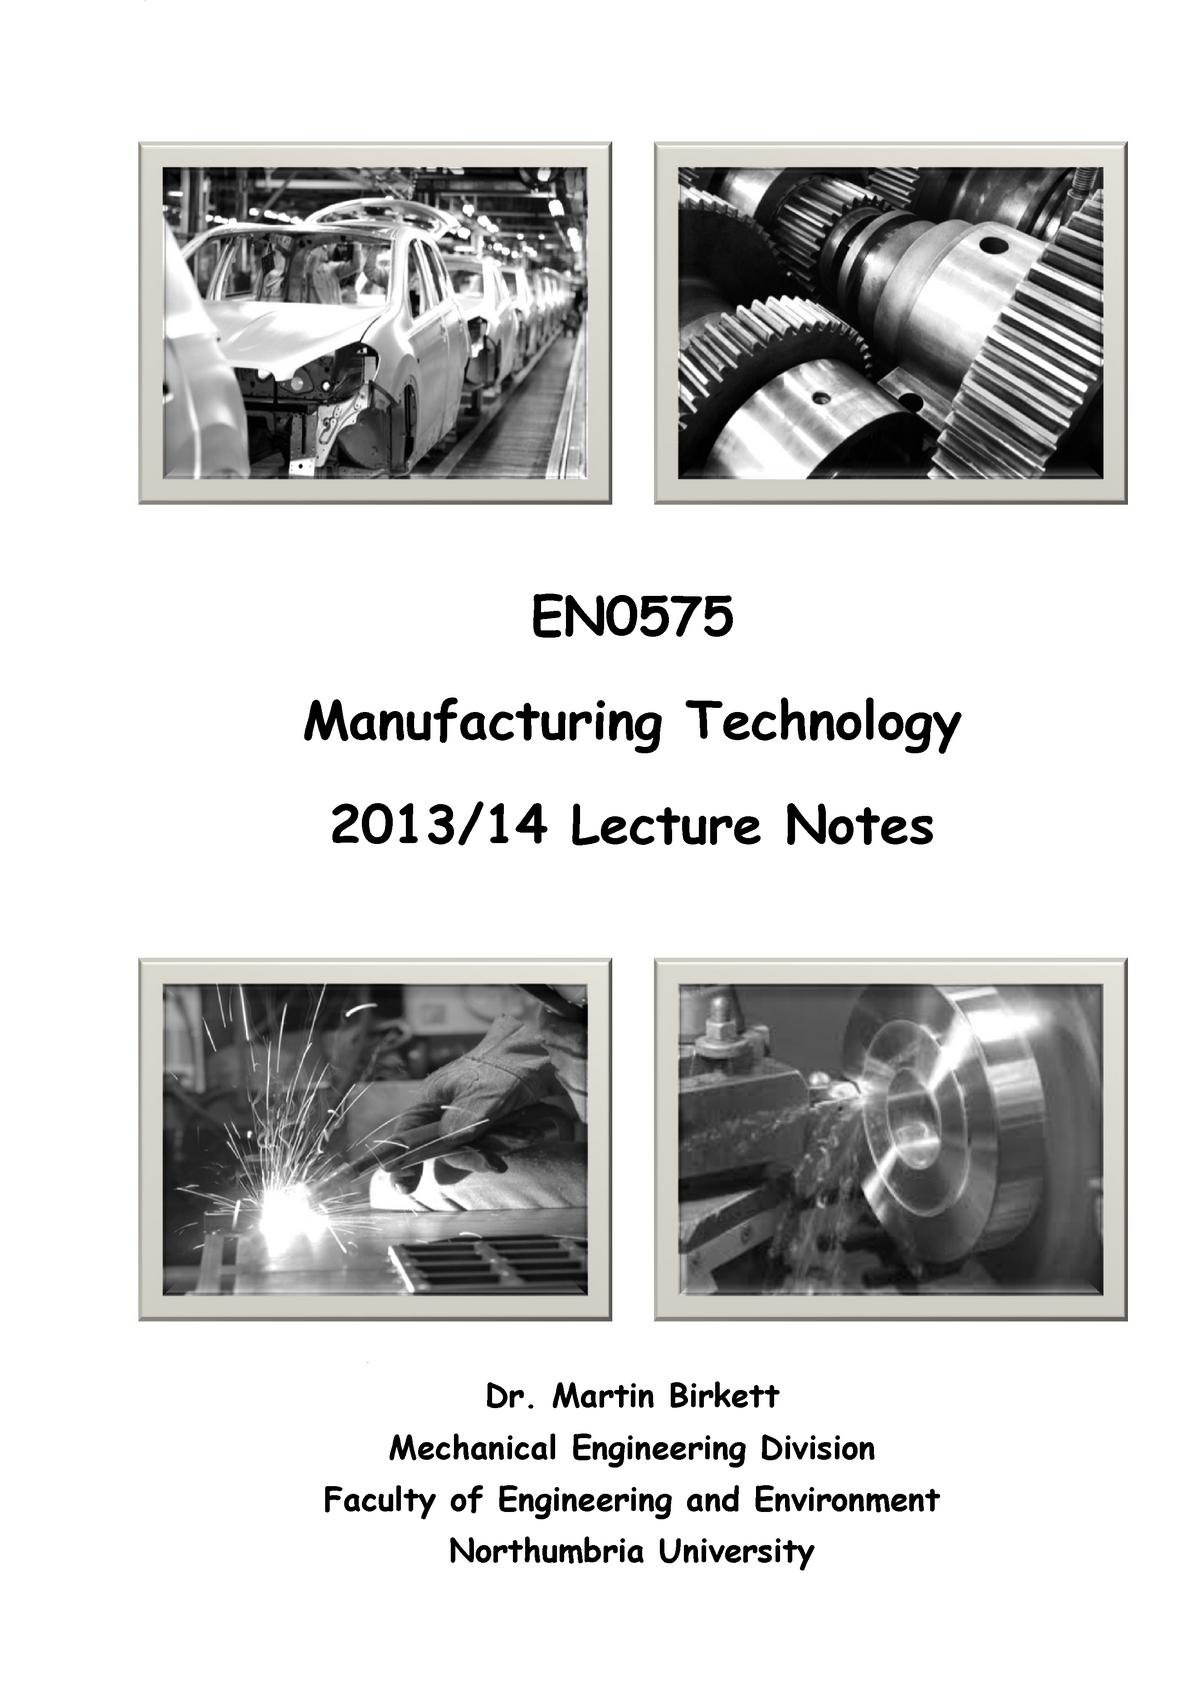 Lecture notes, lecture 1 - -student notes - part 1(2) - part